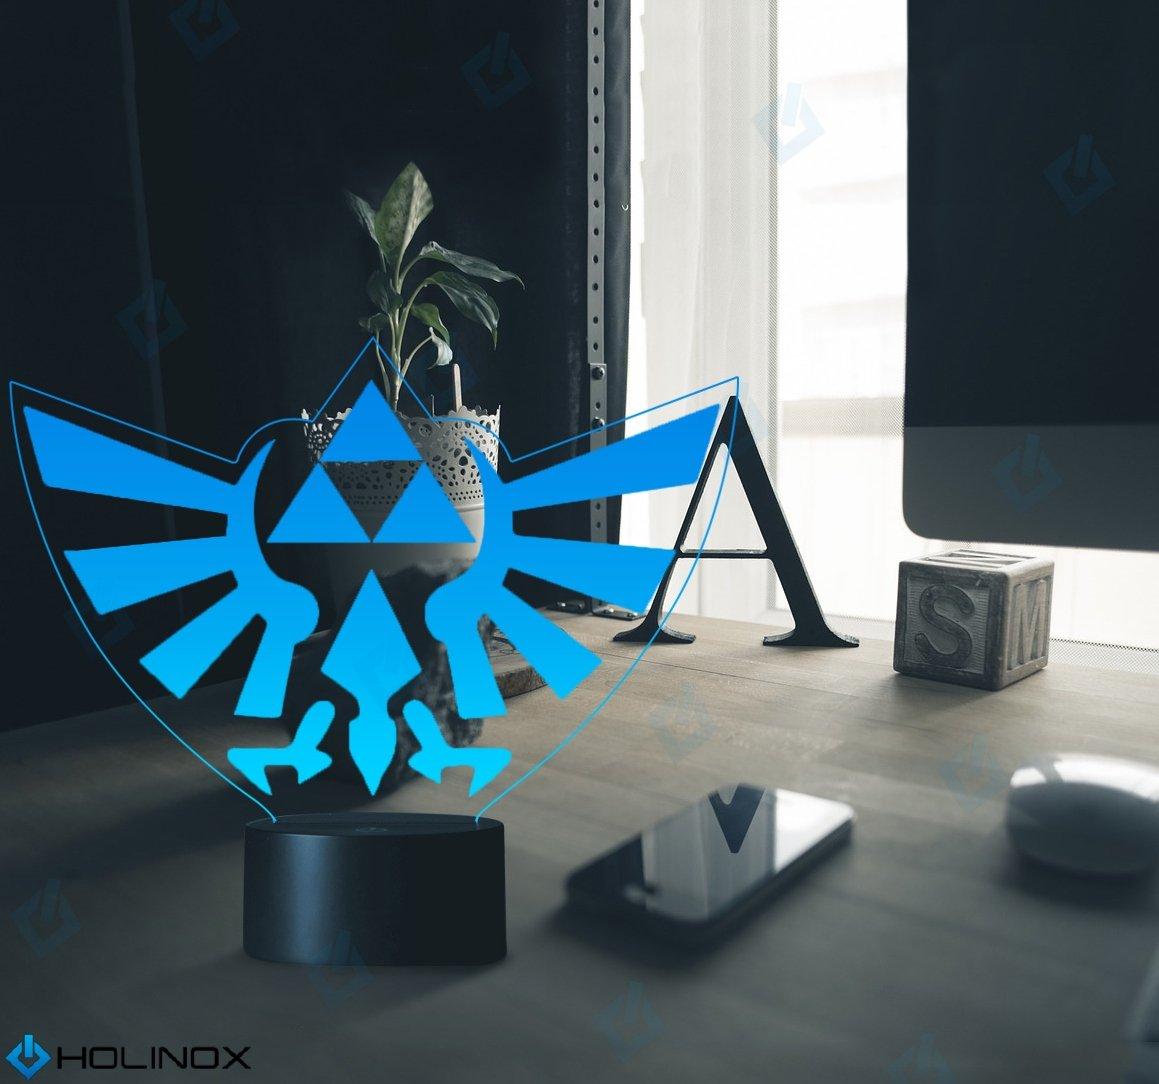 Legend Of Zelda Triforce Lighting Decor Gadget Lamp + Sticker Decor For Perfe.. 8